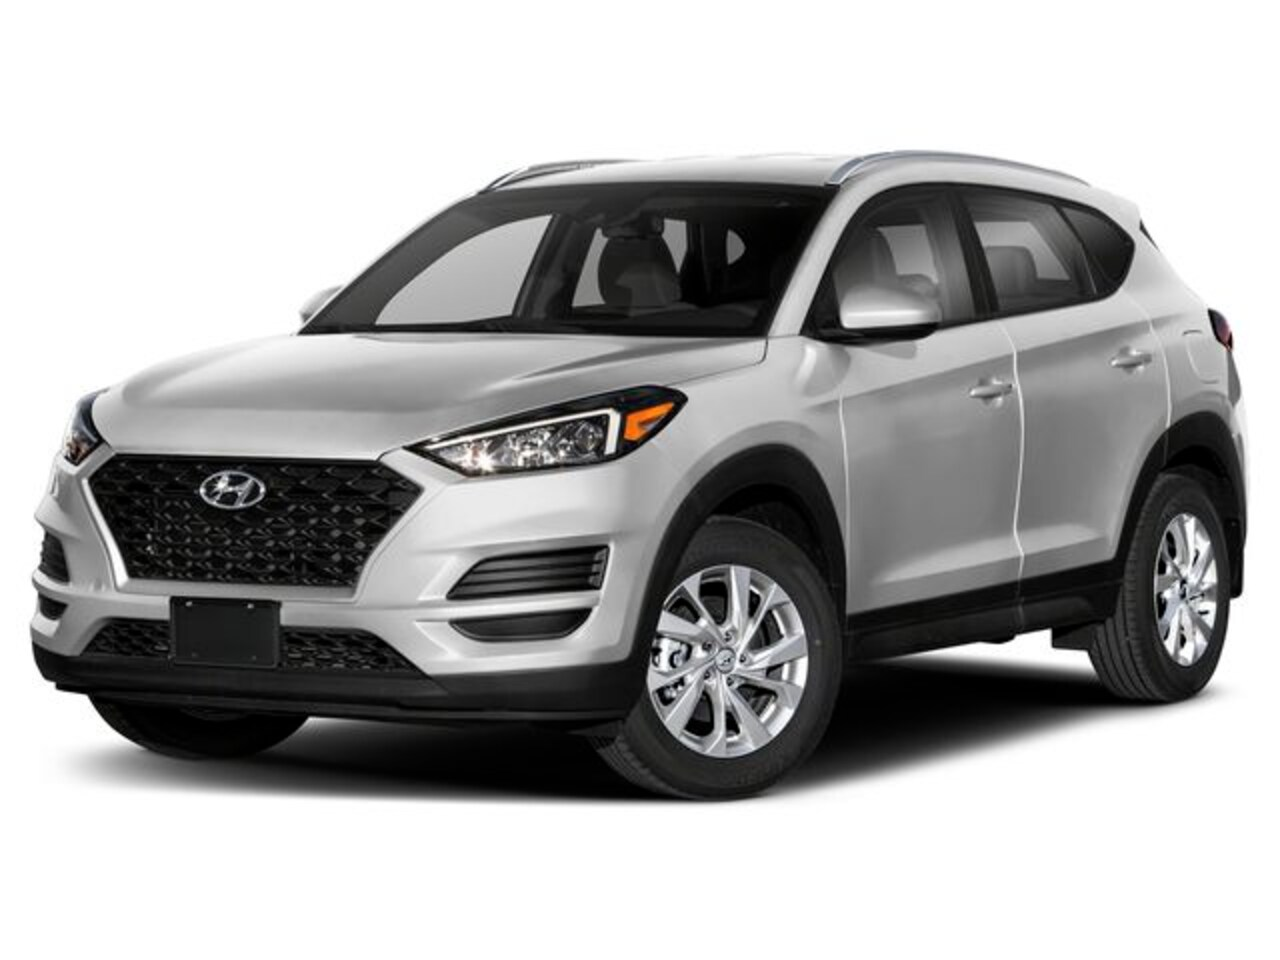 2019 Hyundai Tucson FWD 2.0L Essential Safety Package SUV